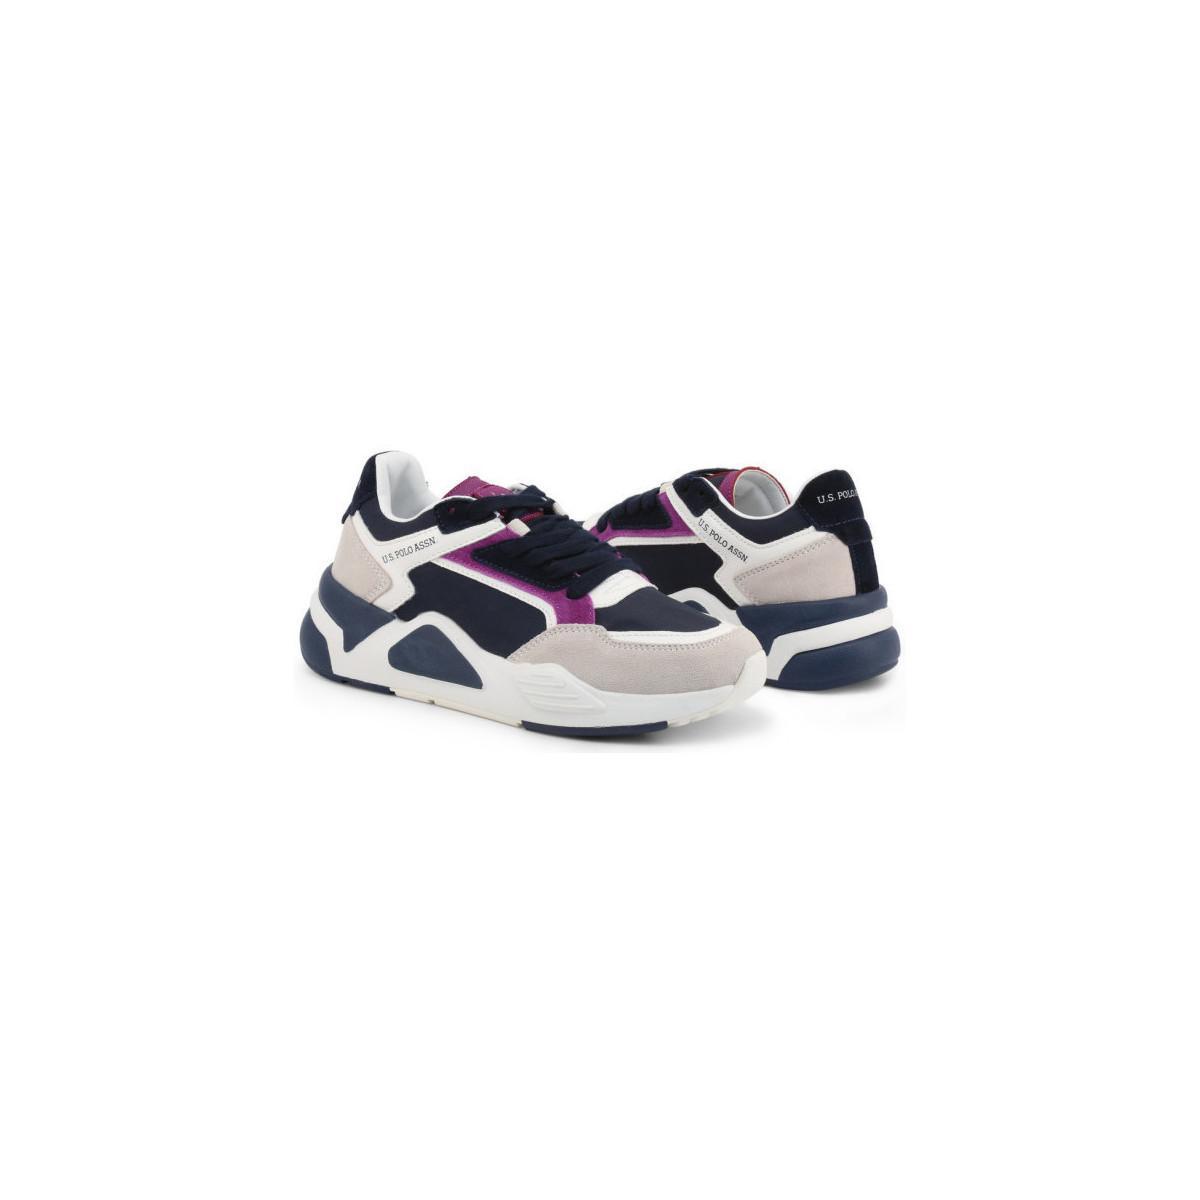 Baskets U.S. Polo Assn. - BE U.S. POLO ASSN. en coloris Blanc RjYh